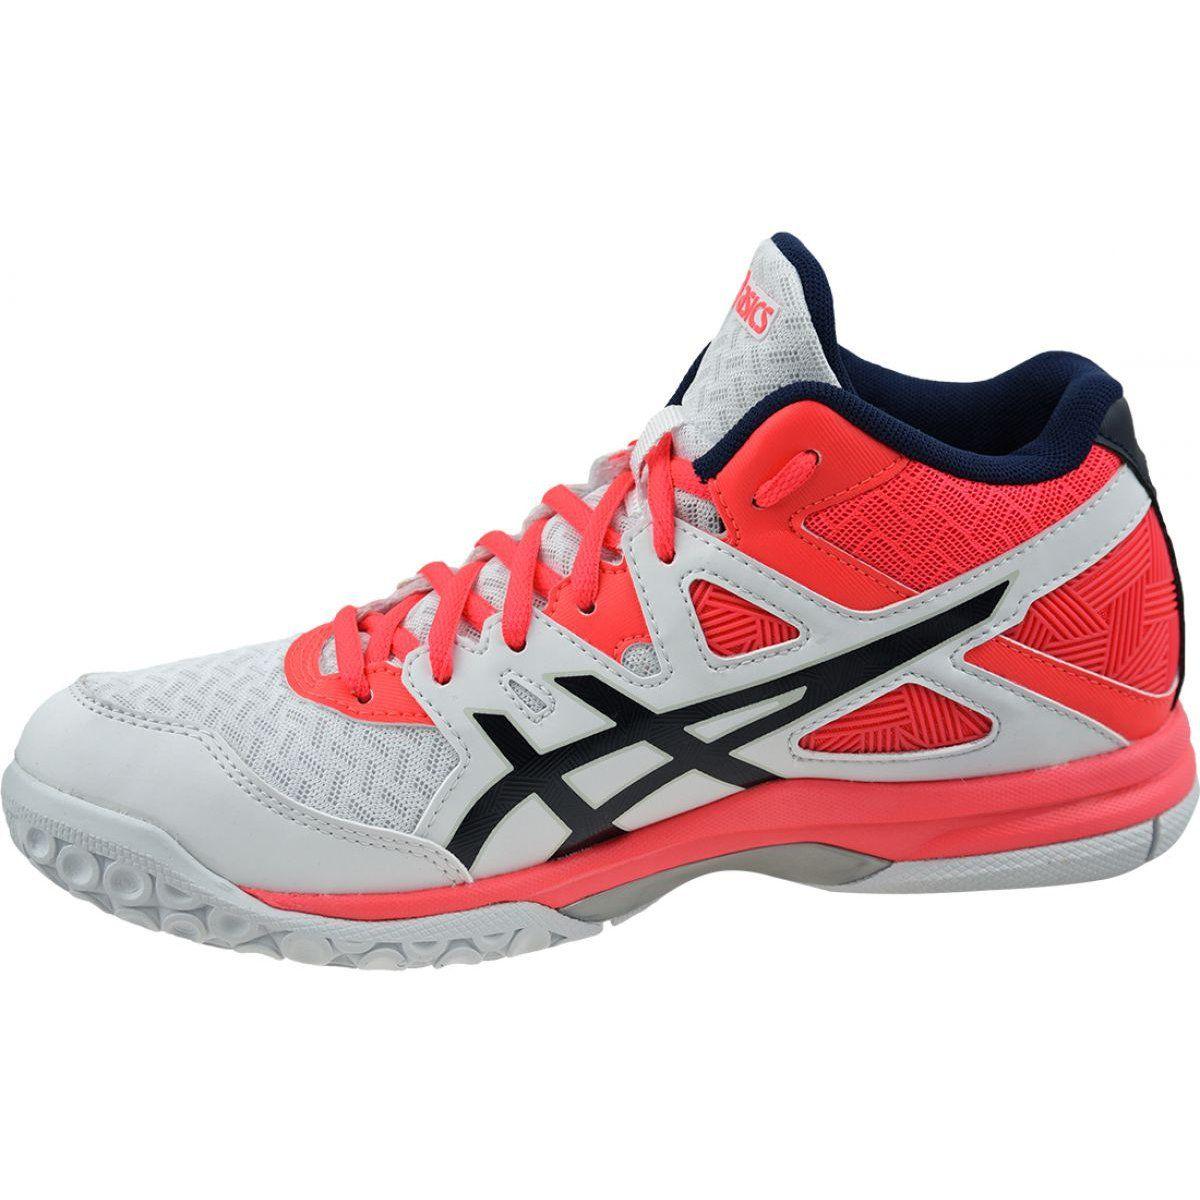 Asics Gel Task Mt 2 M 1072a037 101 Shoes White White Asics Asics Shoes Shoes